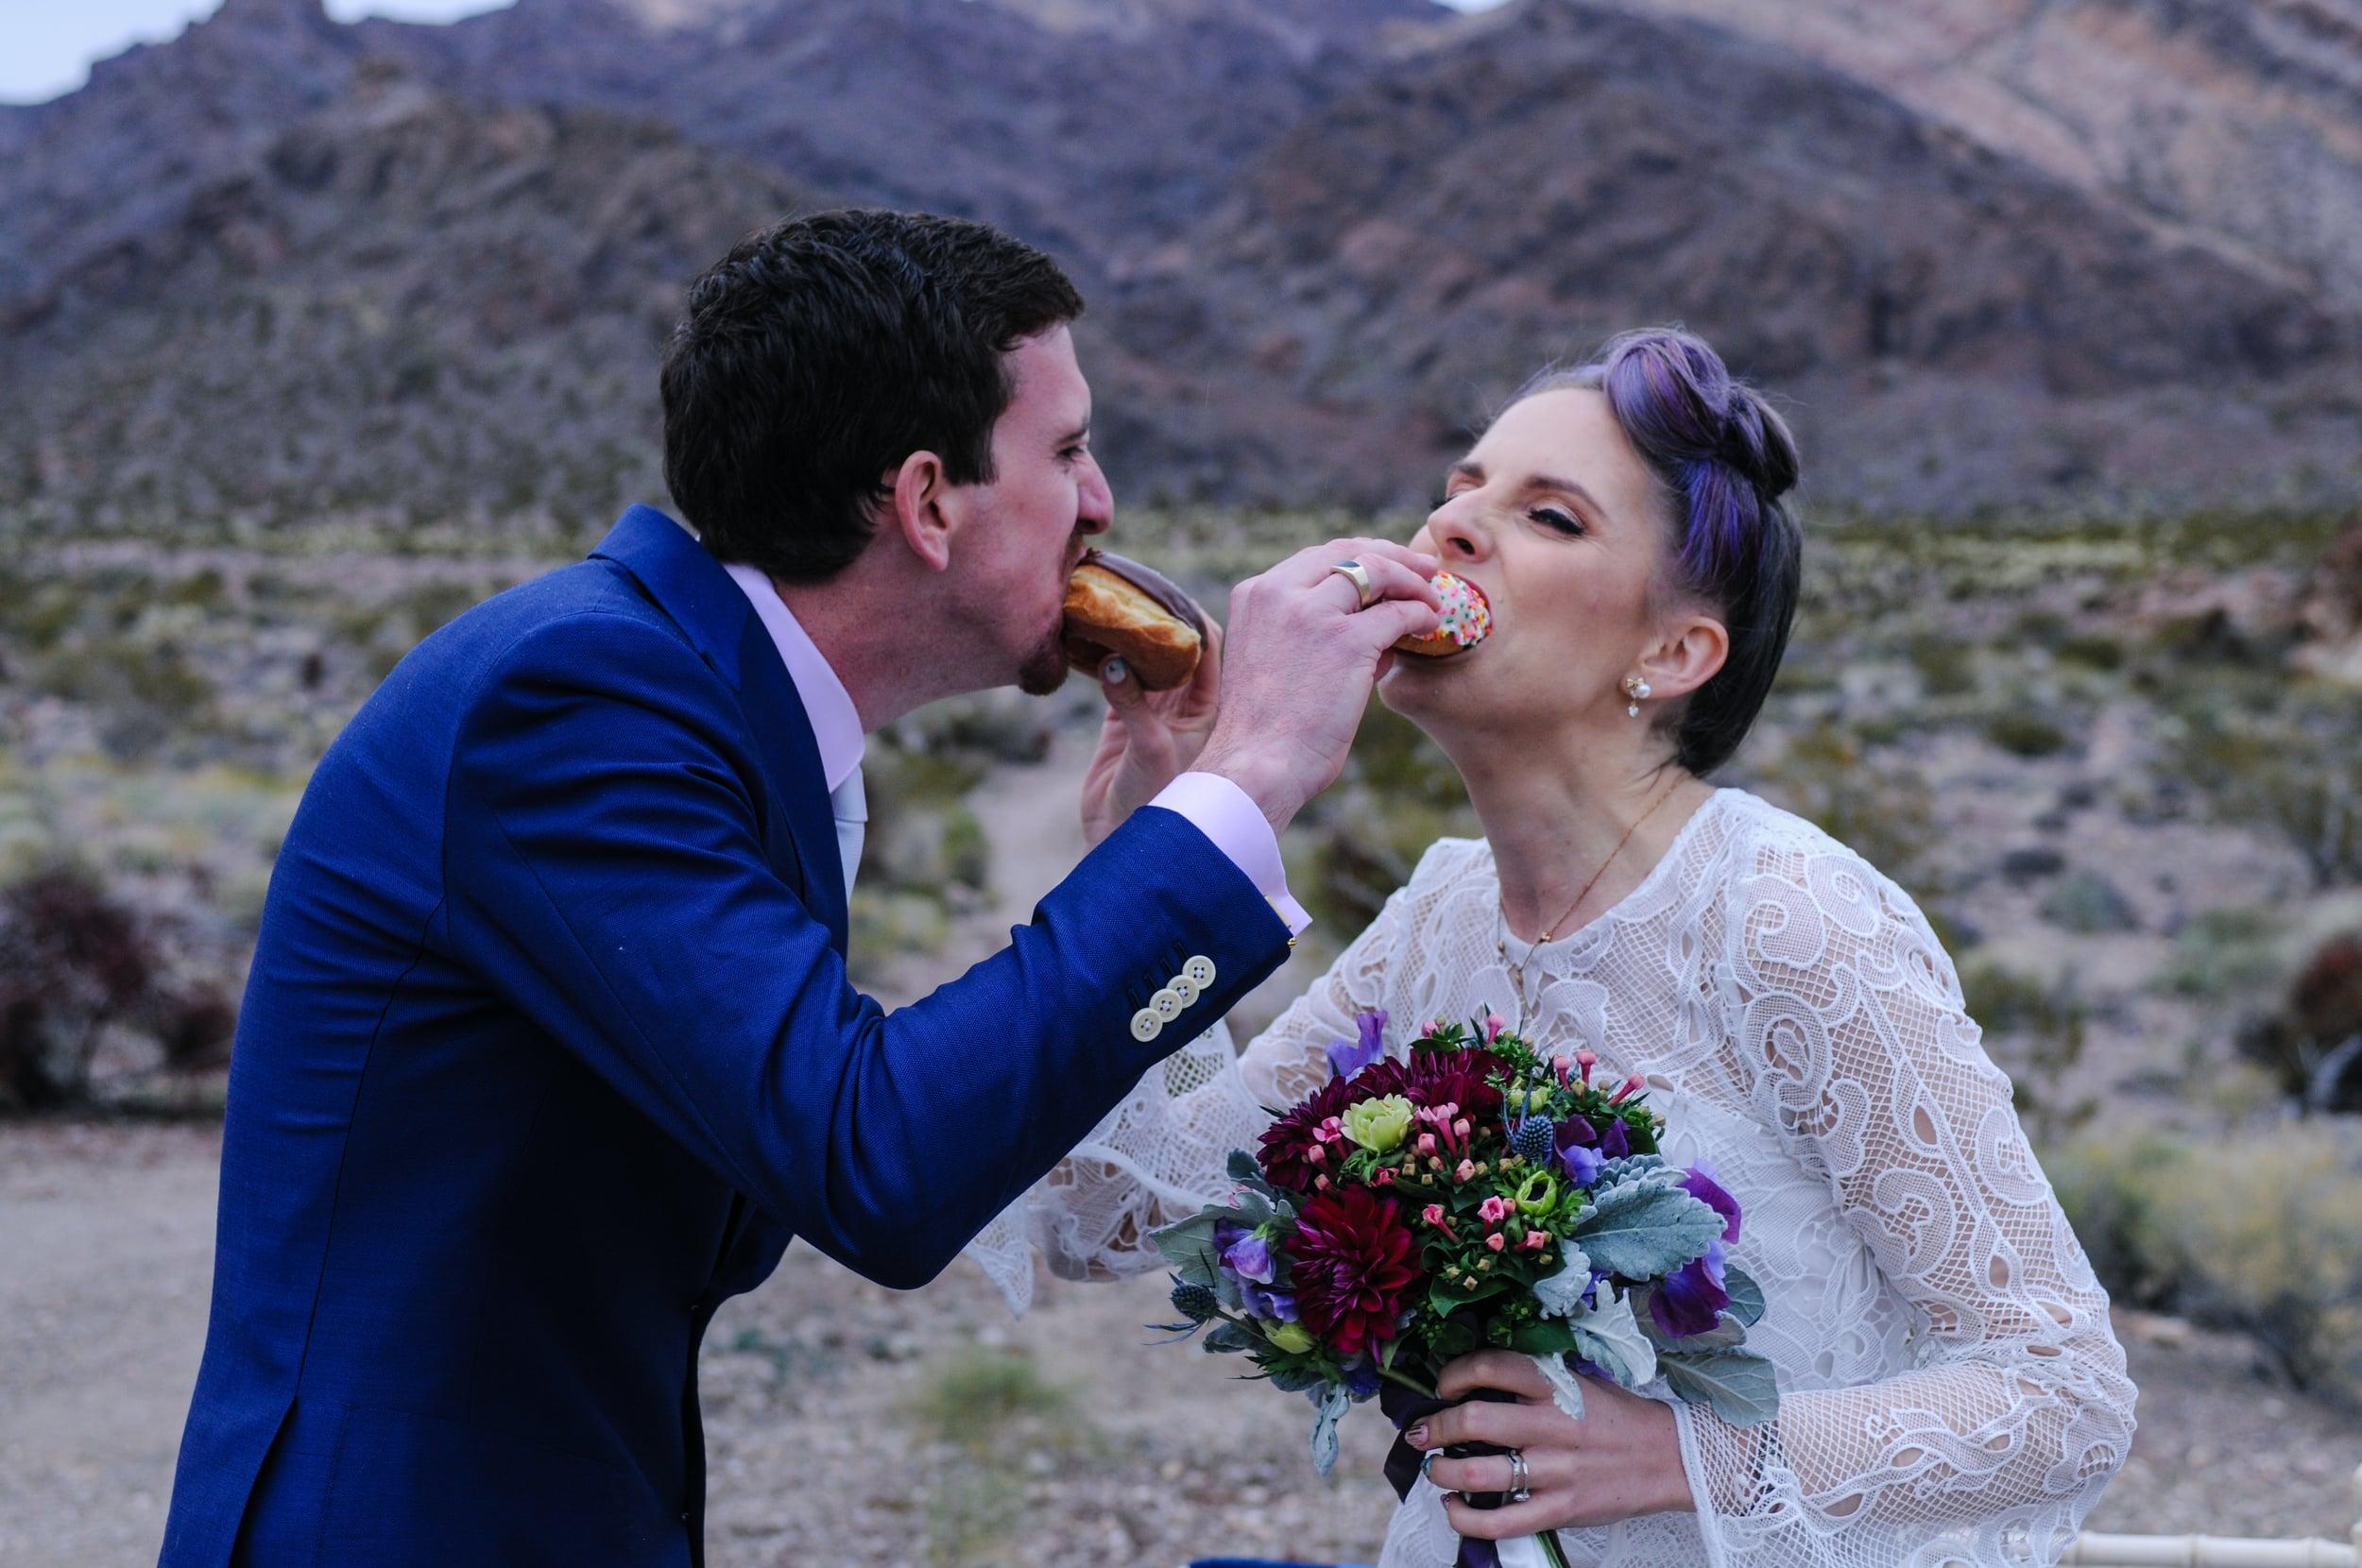 pop up wedding, flora pop wedding, elopement, las vegas elopement, desert elopement, smoke bomb wedding